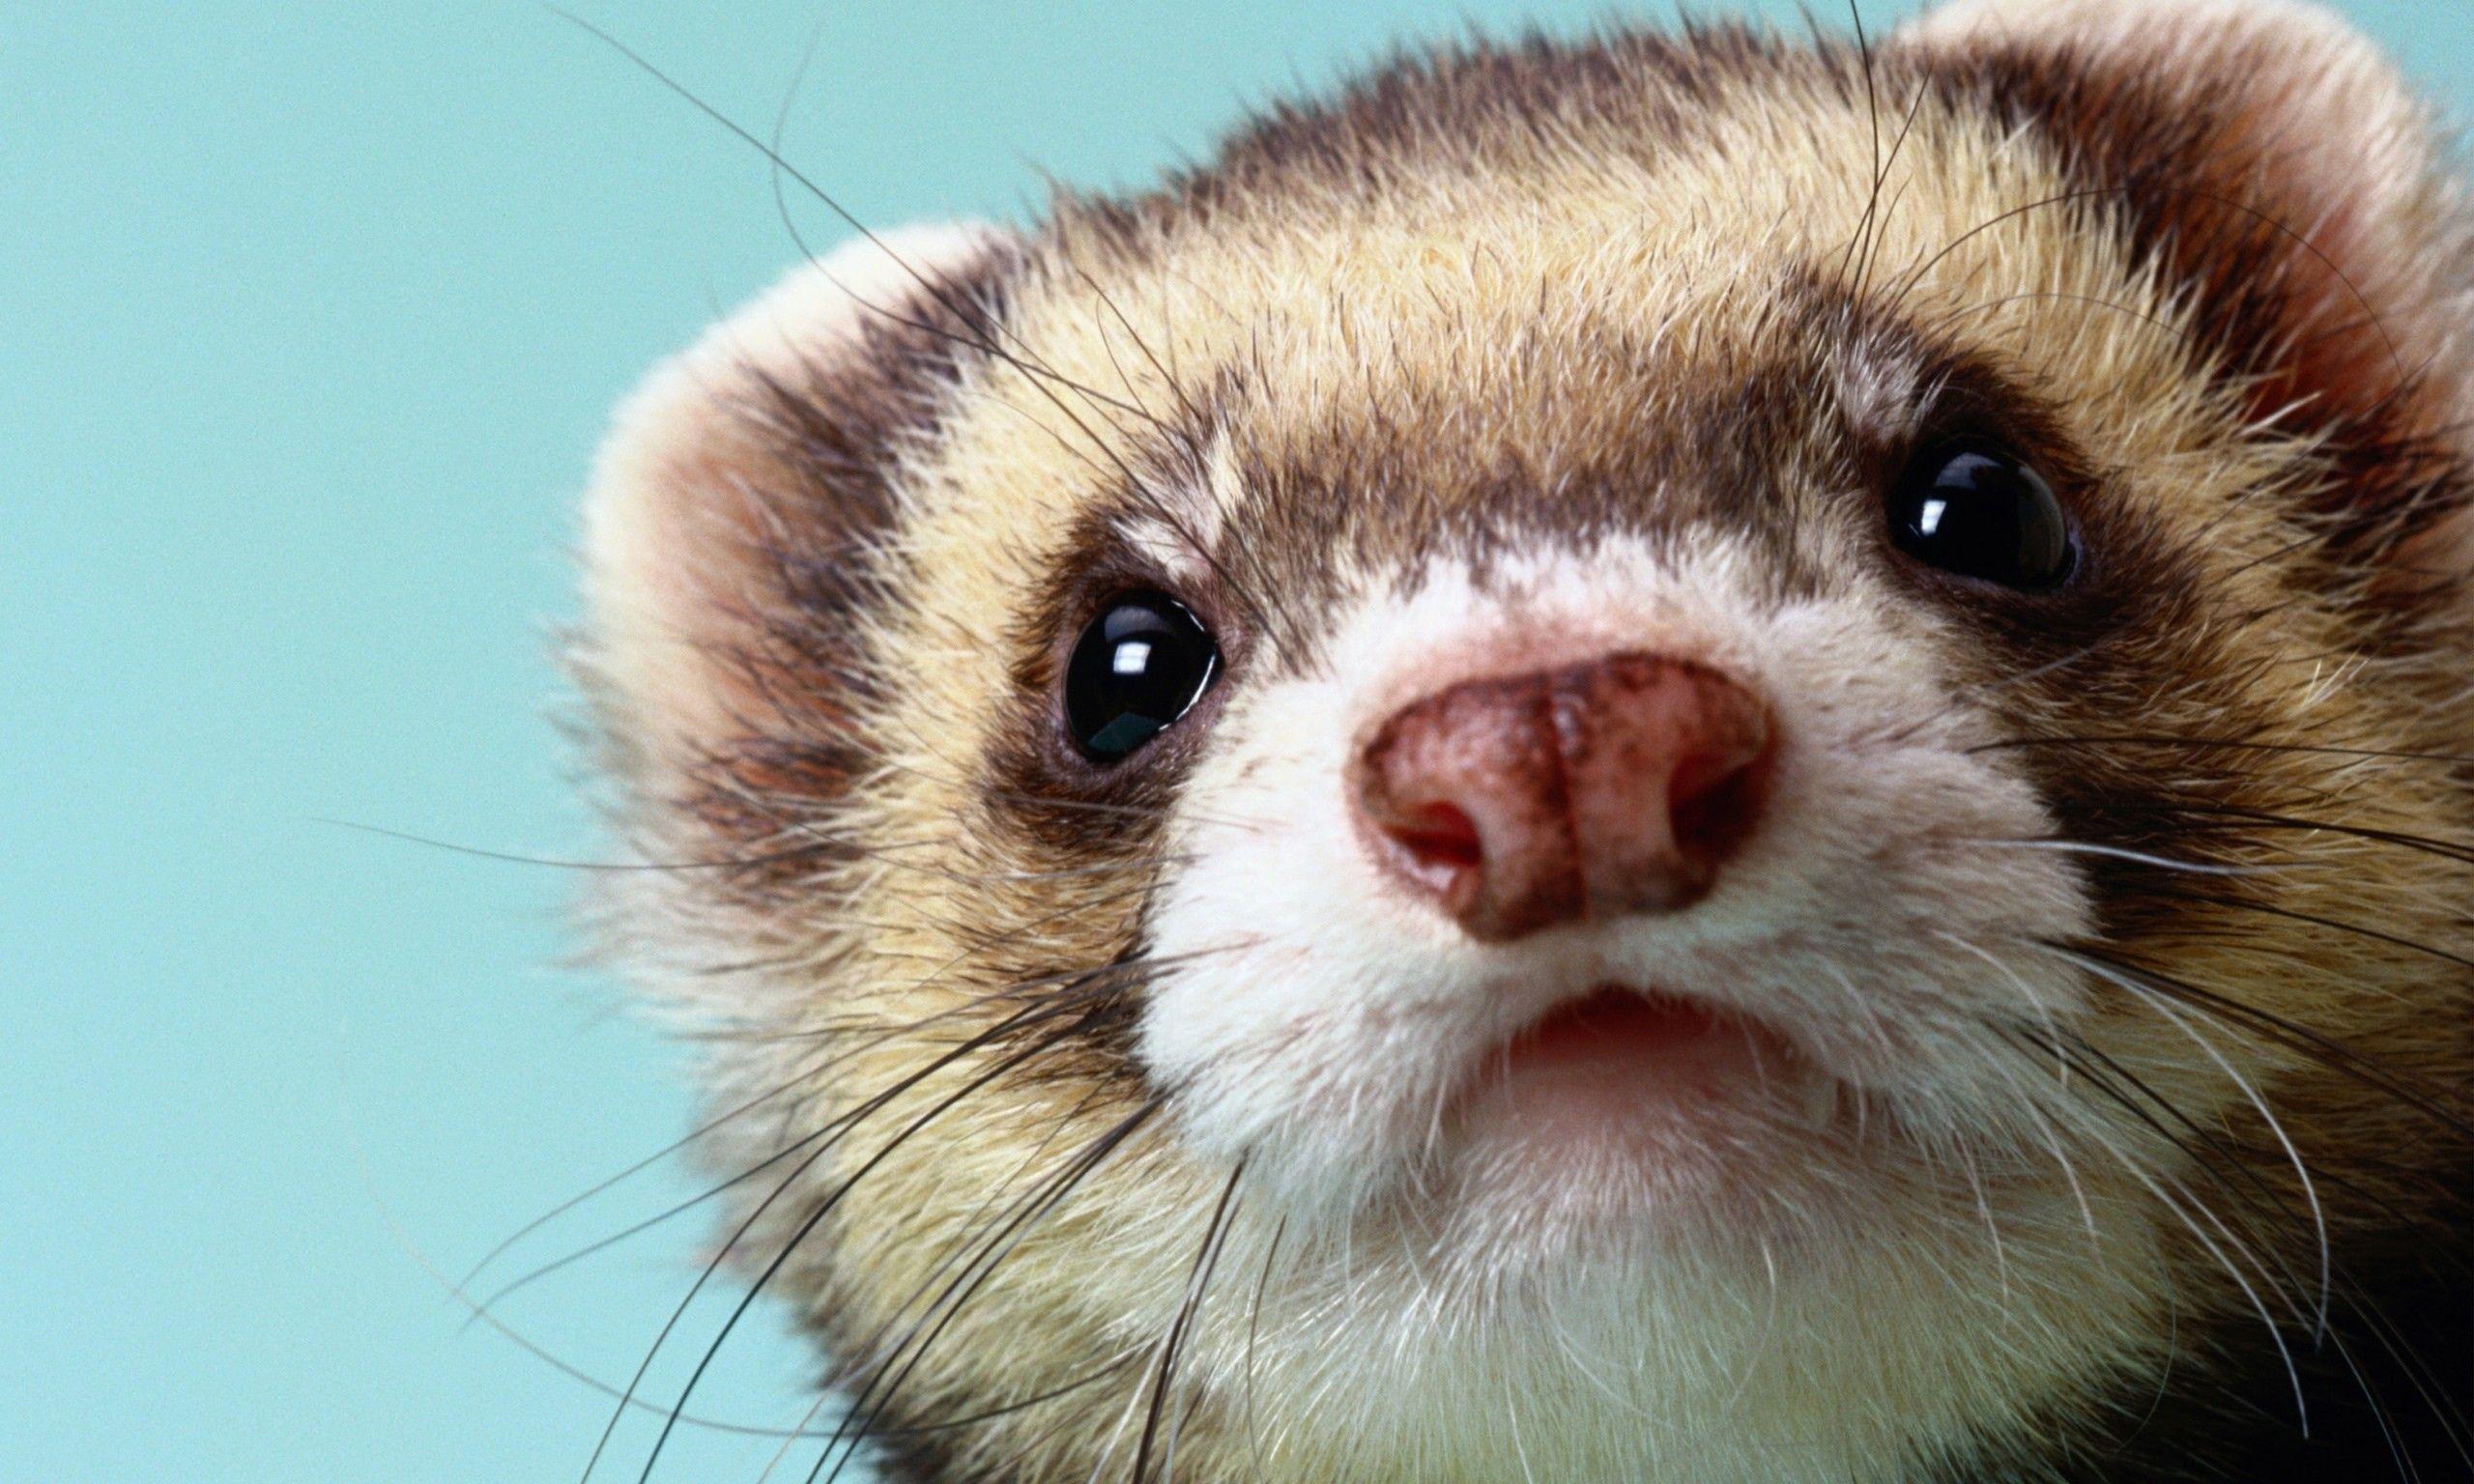 Ferret Wallpapers Top Free Ferret Backgrounds Wallpaperaccess